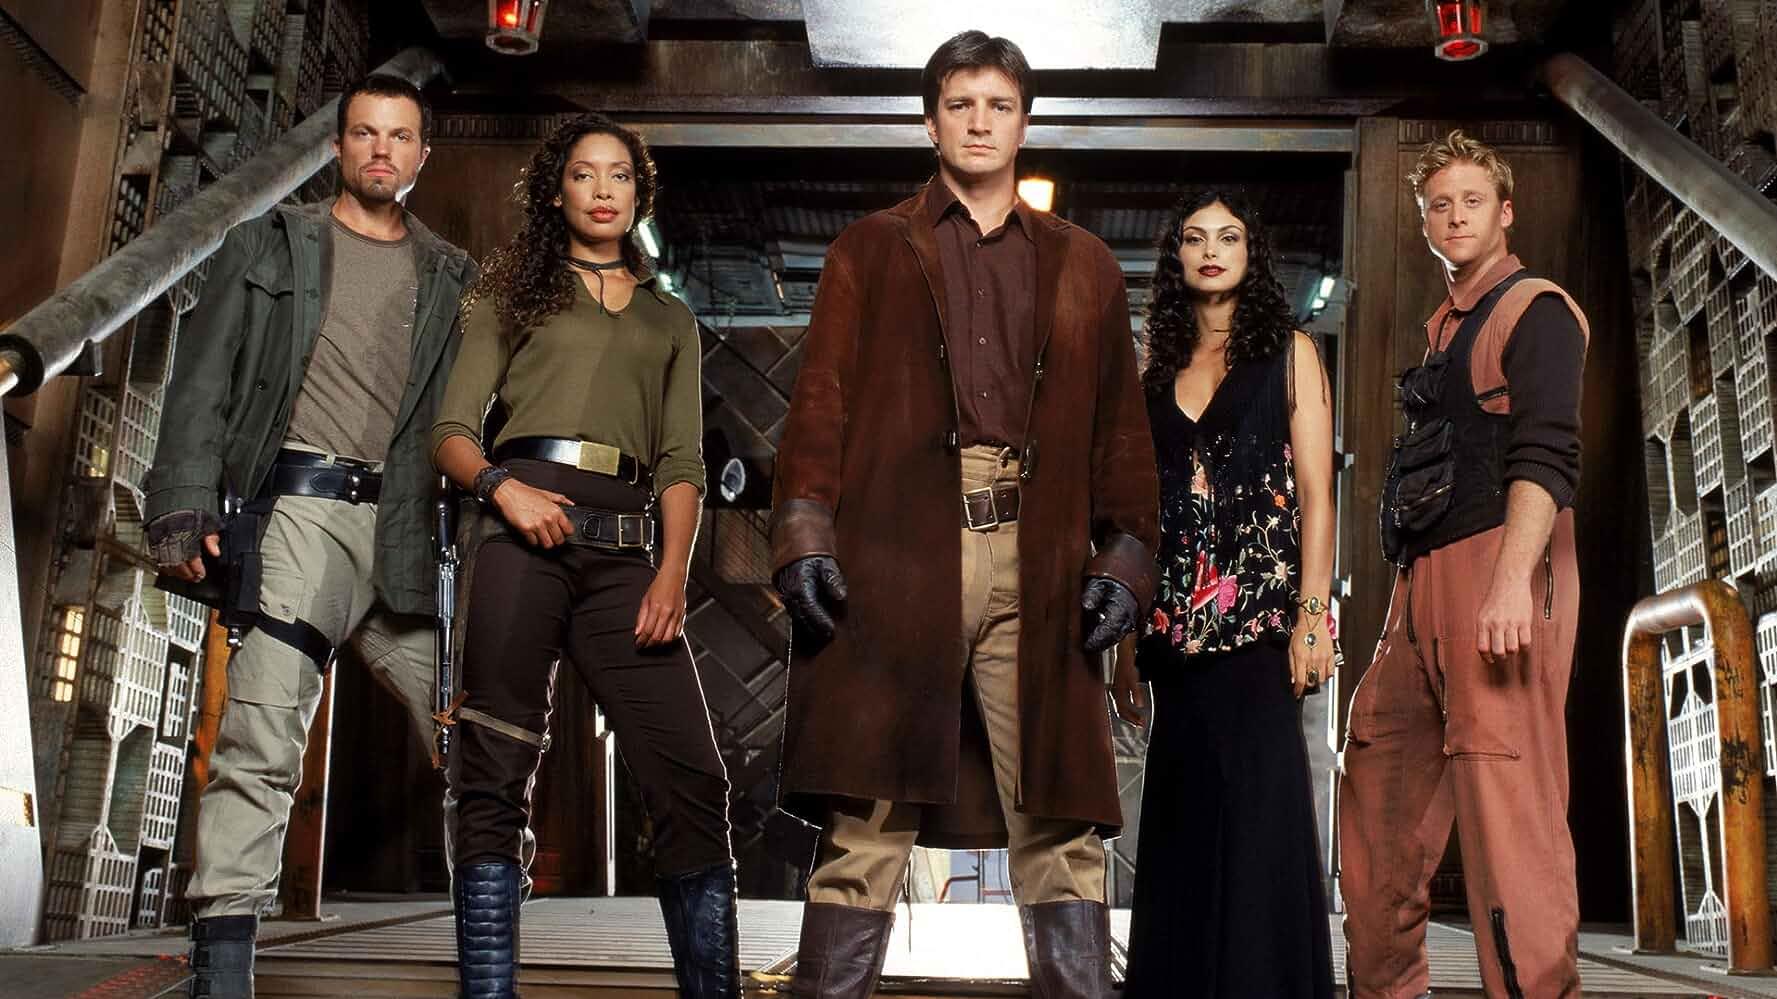 Adam Baldwin, Nathan Fillion, Gina Torres, Alan Tudyk, and Morena Baccarin in Serenity (2005)